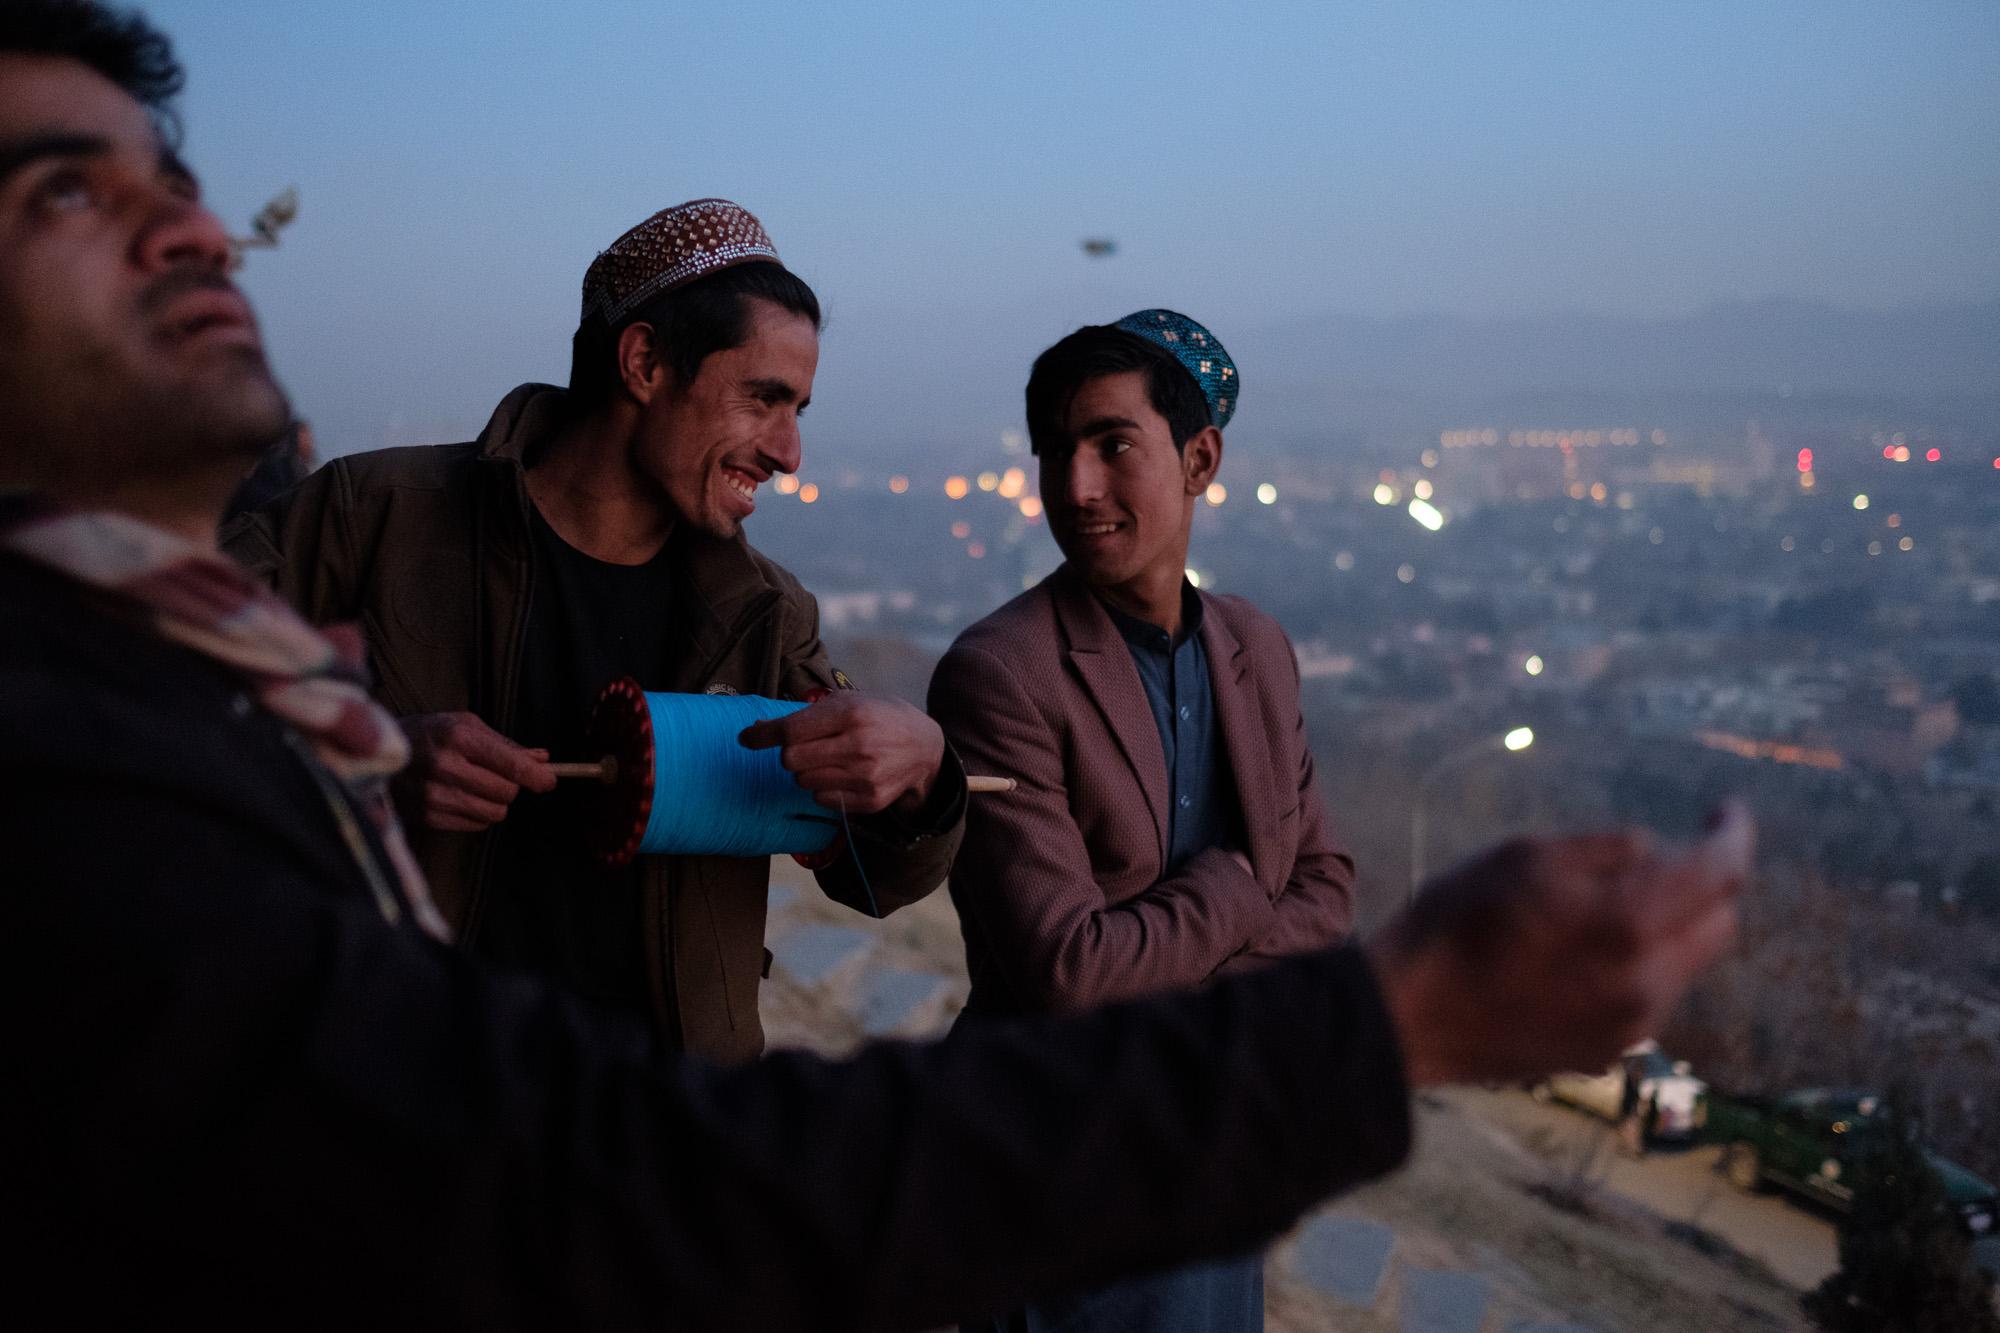 Friday kite-flying session. Kabul, 2018